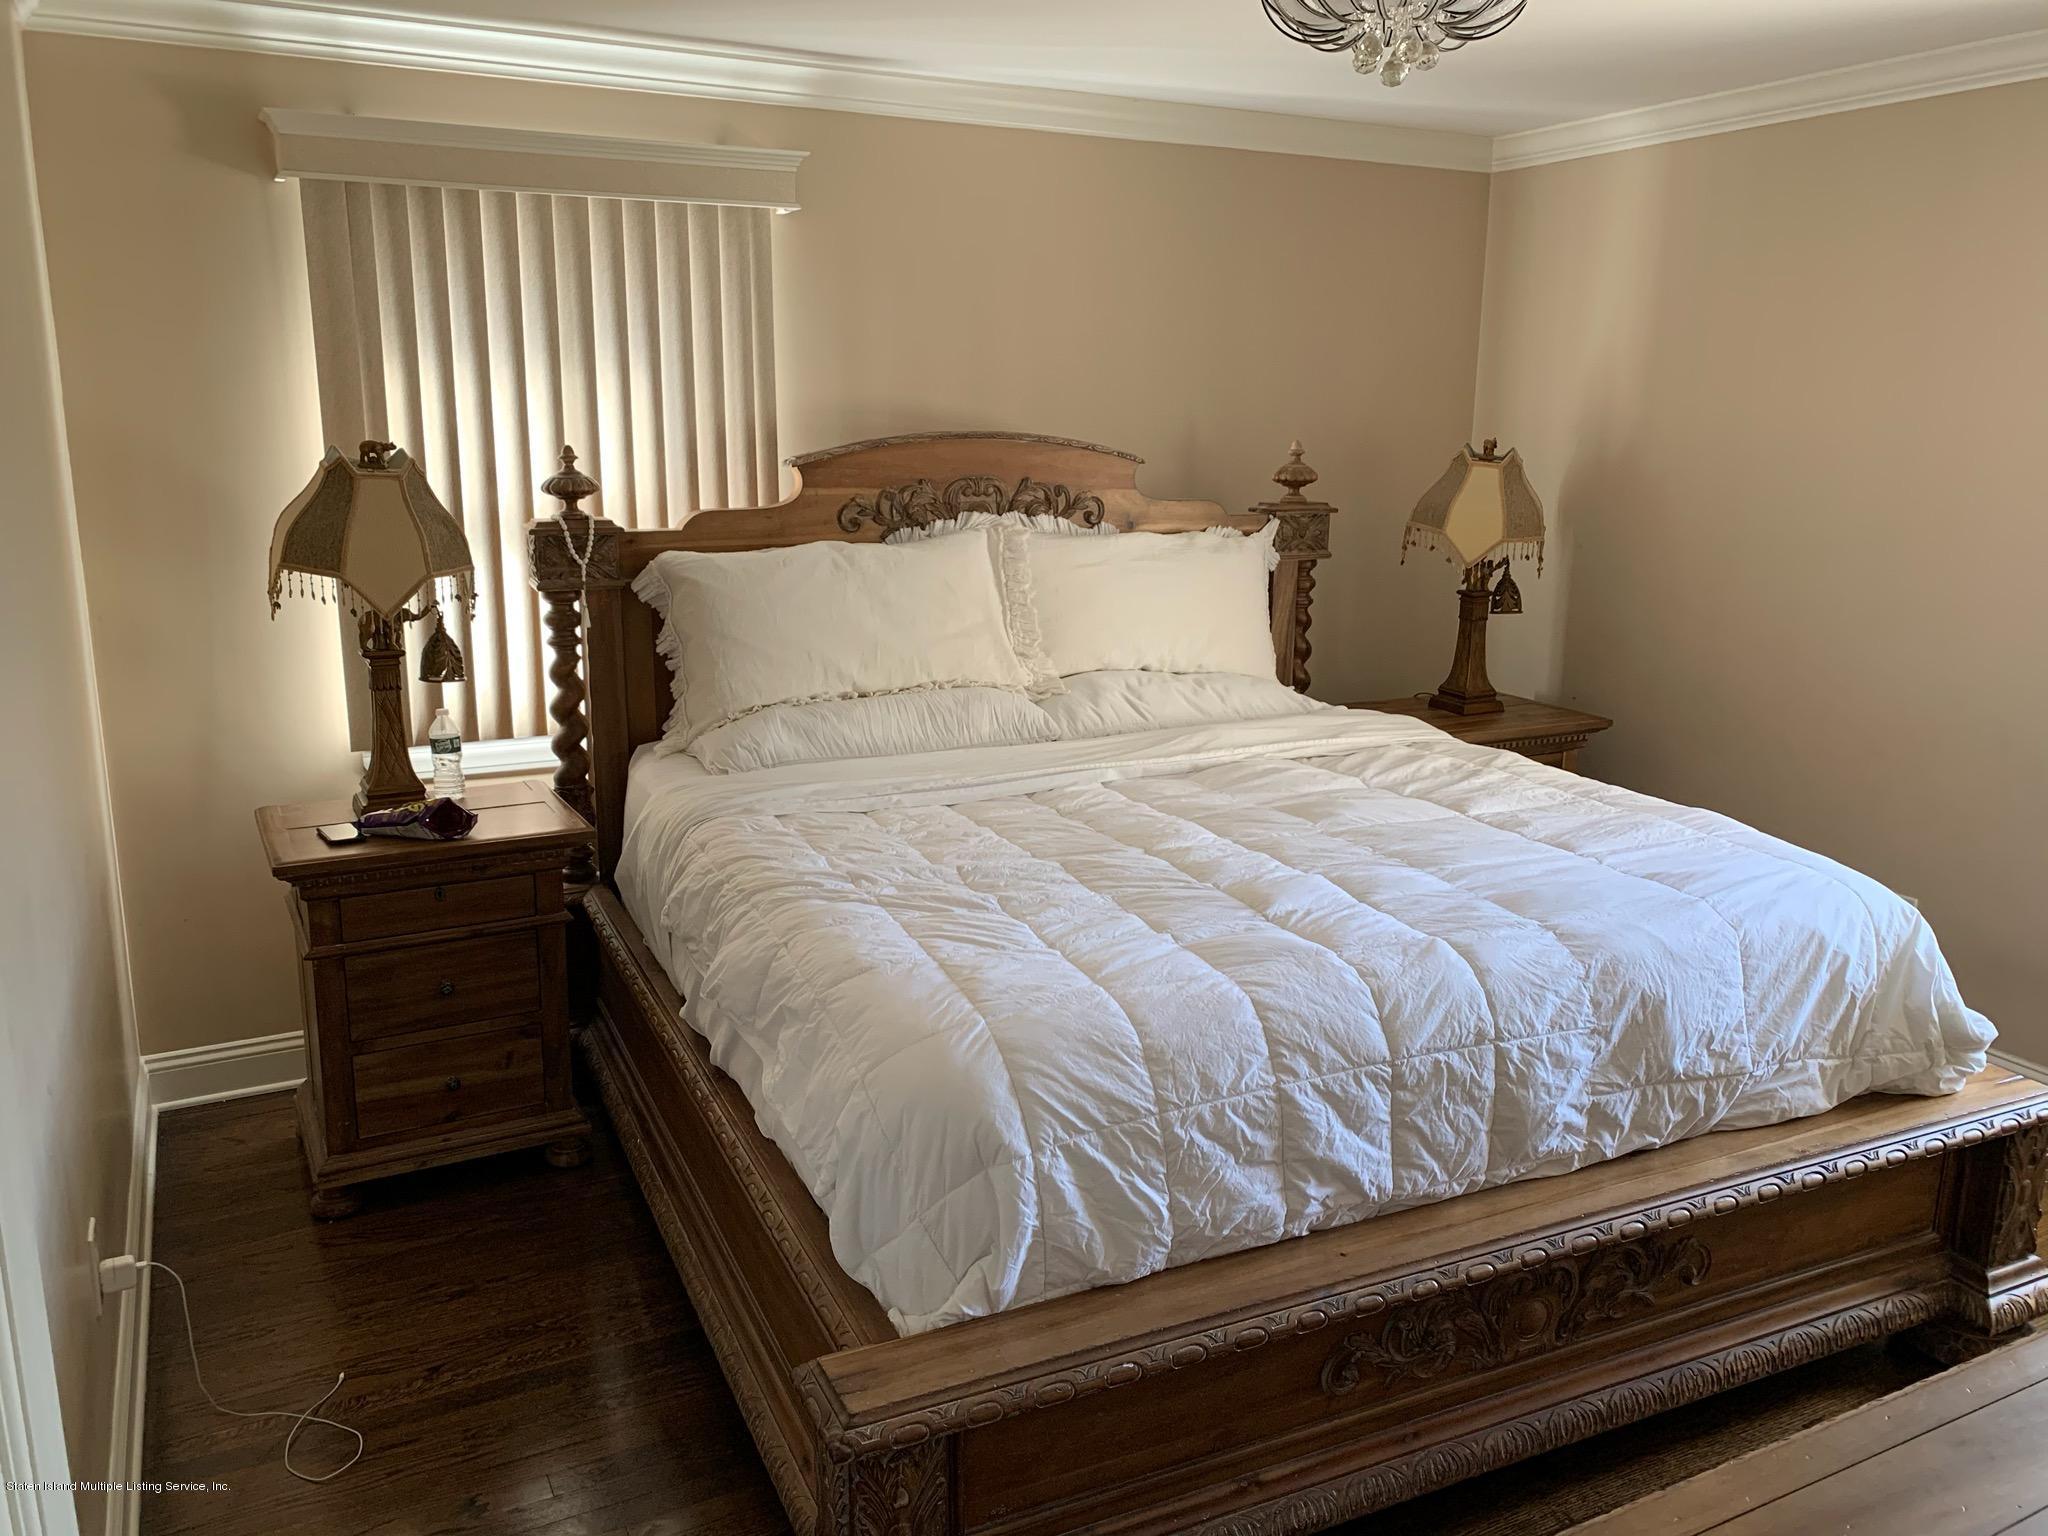 Single Family - Detached 58 Guyon Avenue  Staten Island, NY 10306, MLS-1135873-8